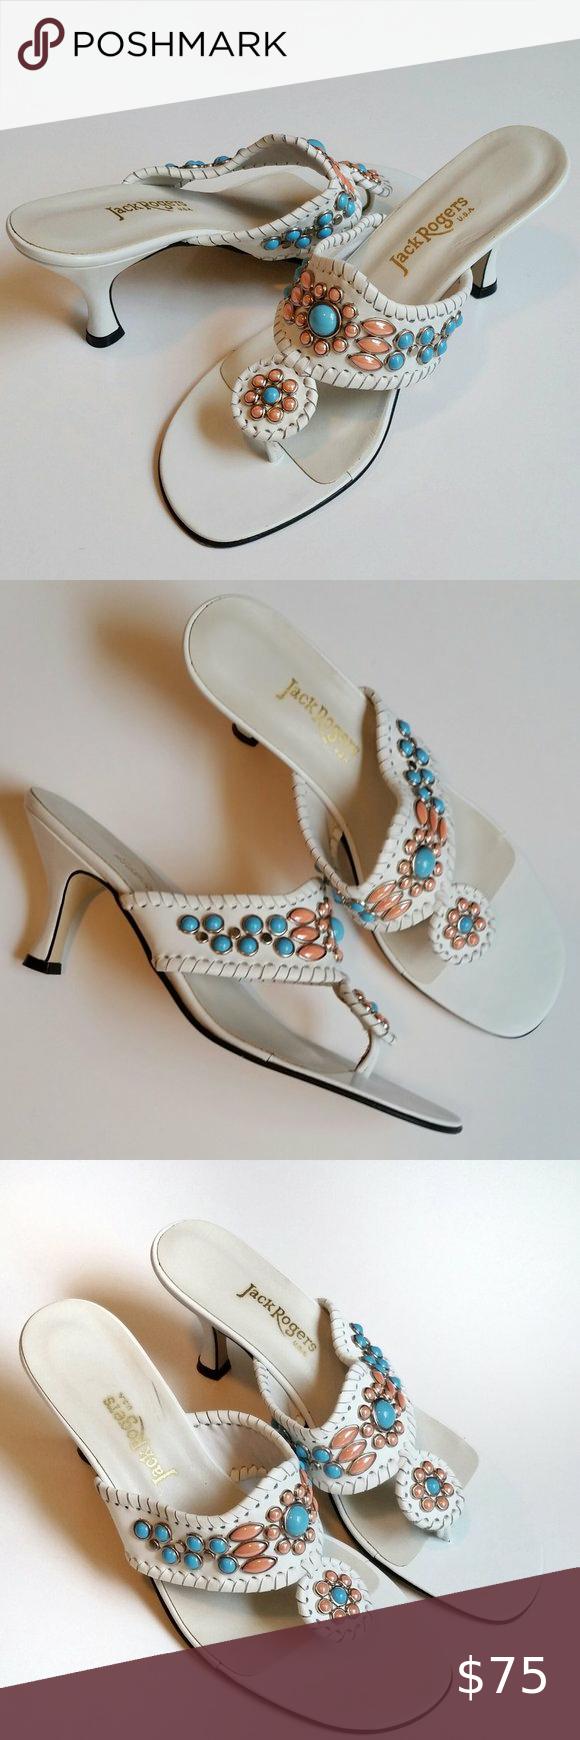 Jack Rogers Embellished Kitten Heel Sandals 9 In 2020 Kitten Heel Sandals Sandals Heels Shoes Women Heels